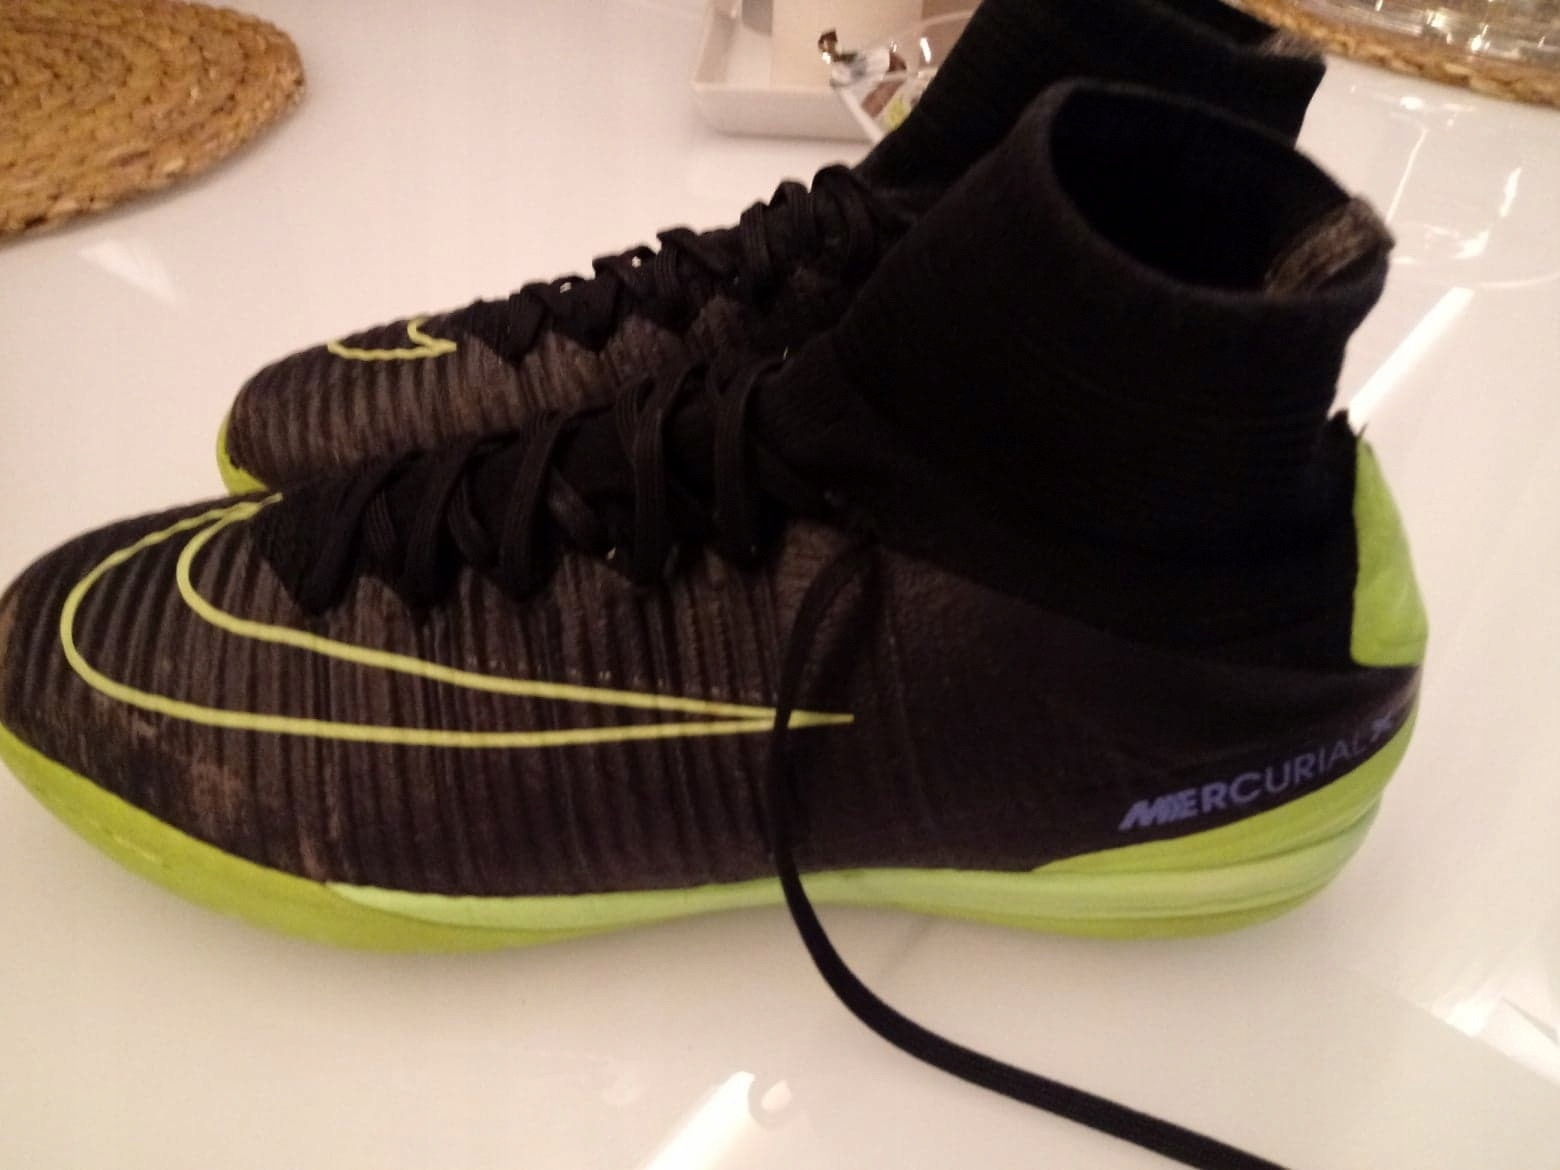 Halówki Nike MercurialX Proximo II rom. 42